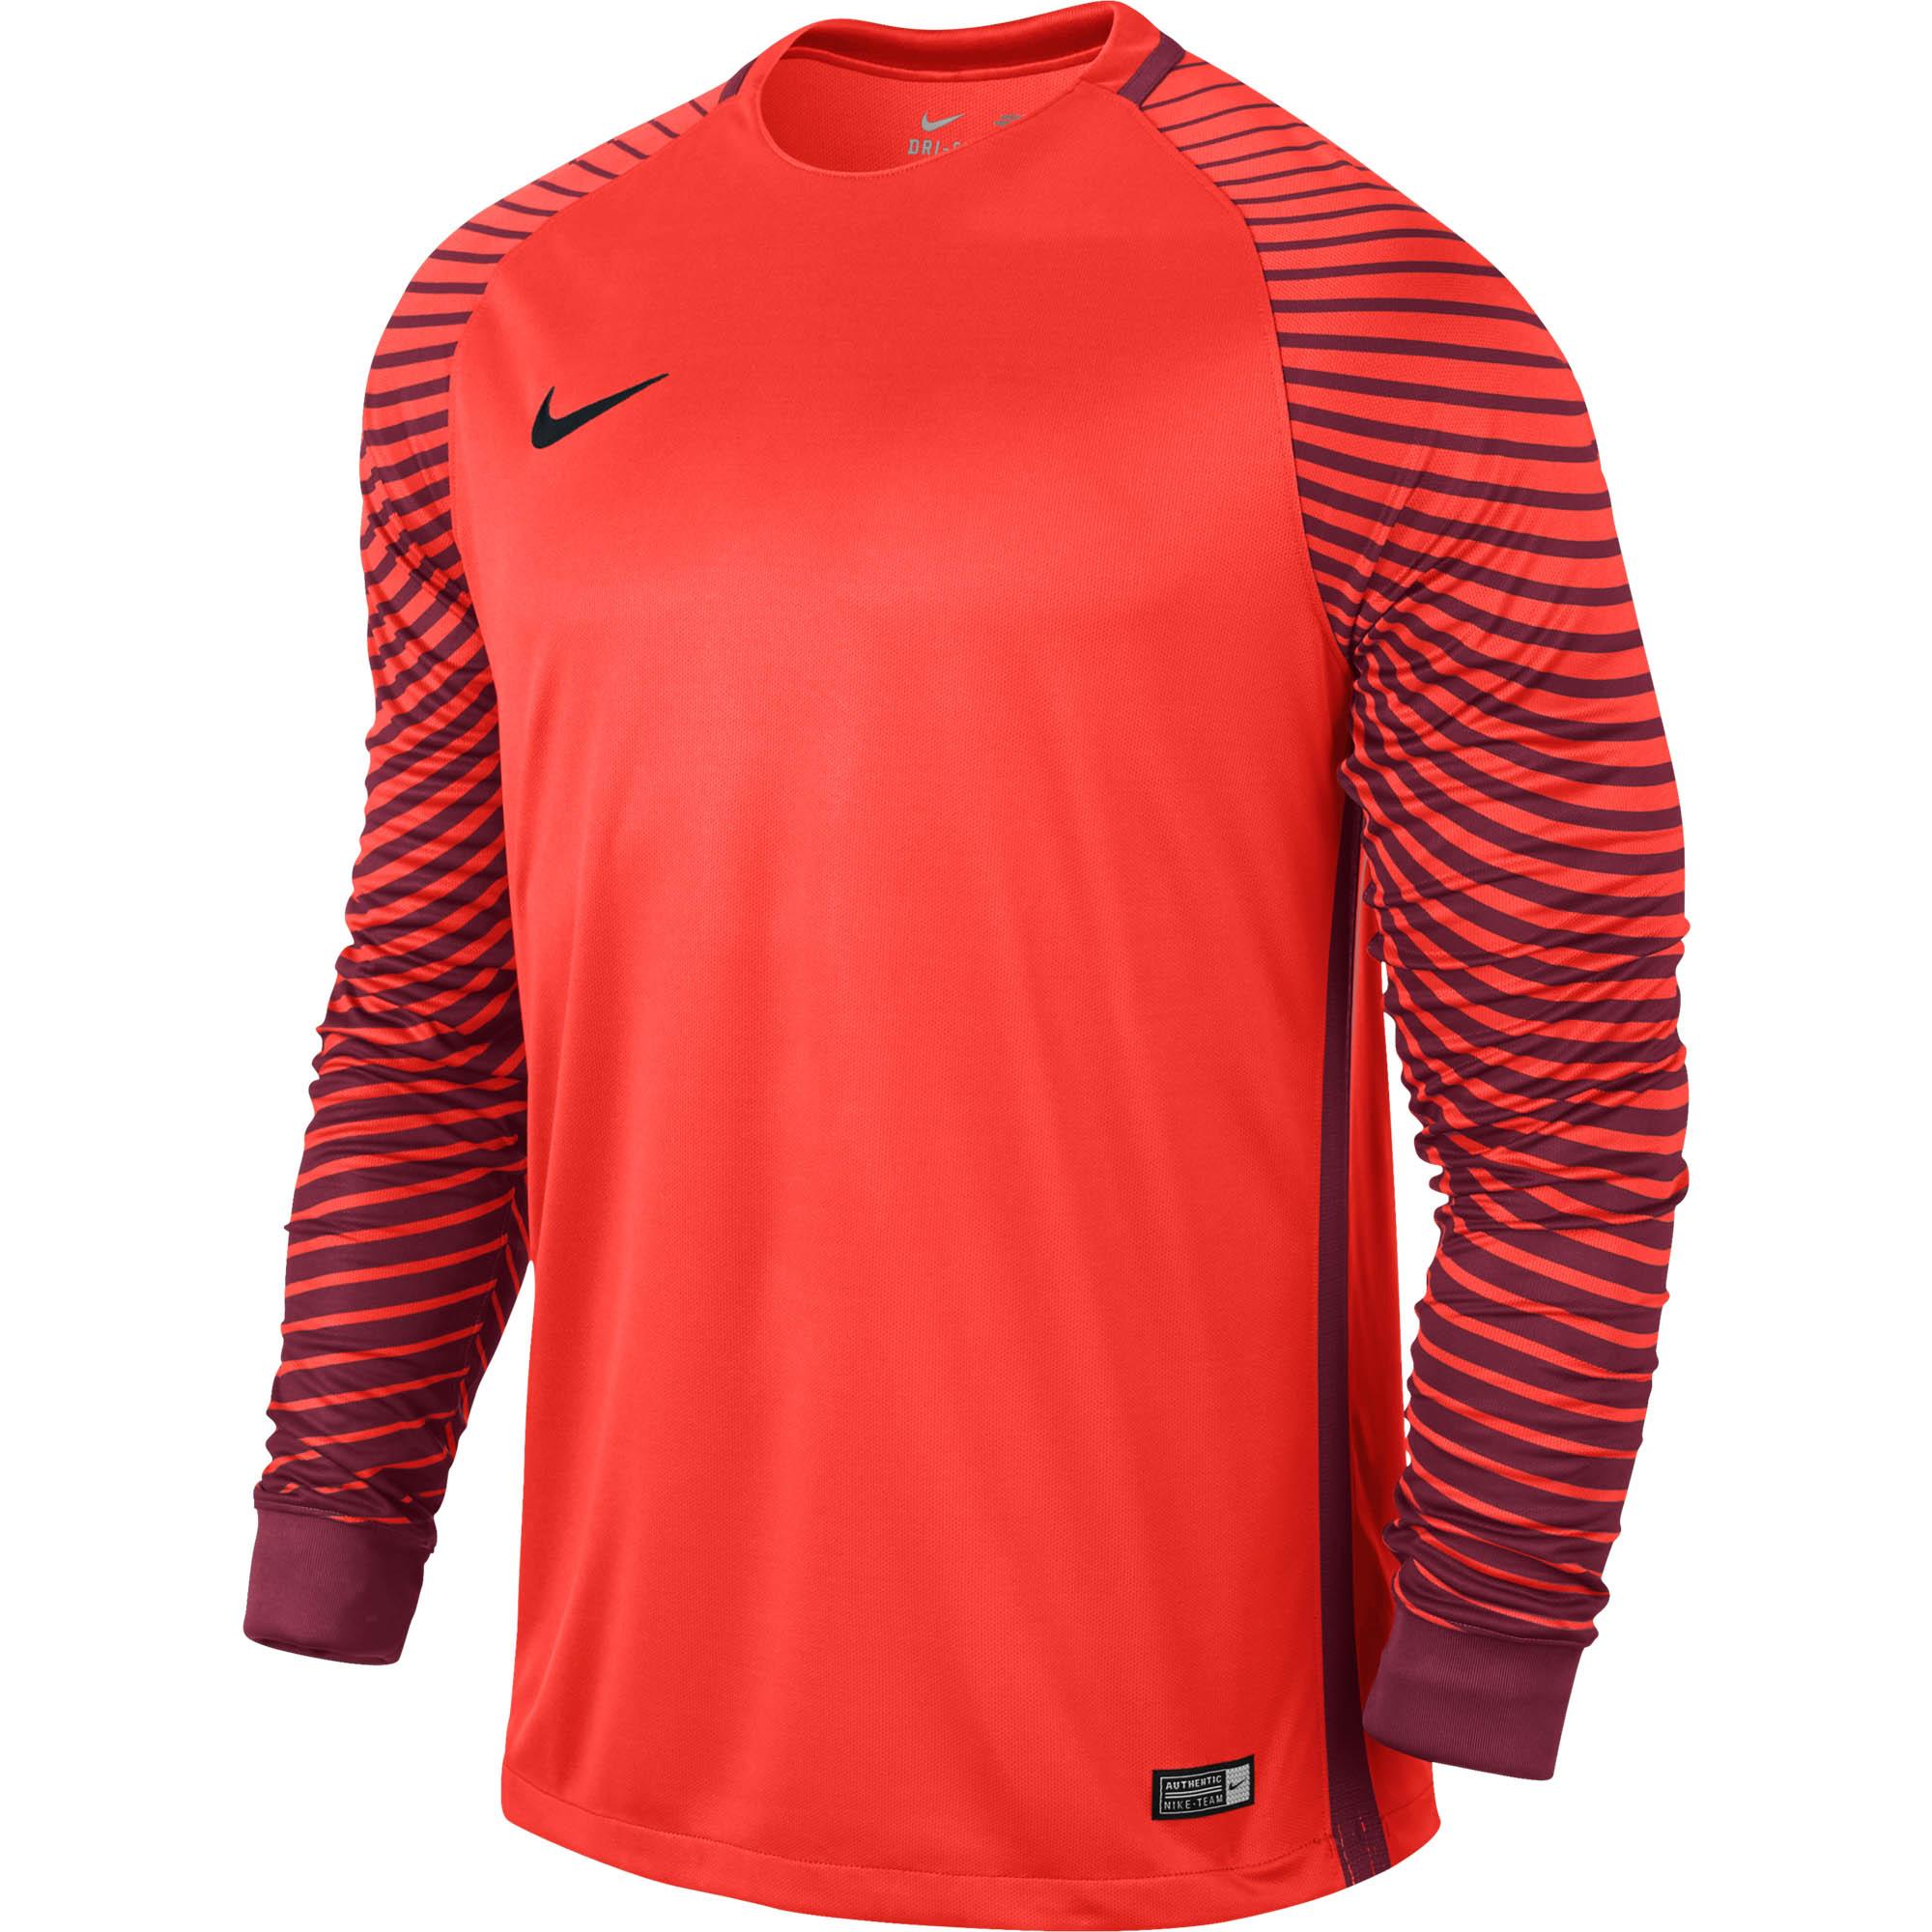 Nike Gardien Goalie Jersey - Bright Crimson Goalkeeper Jersey ca56588bb